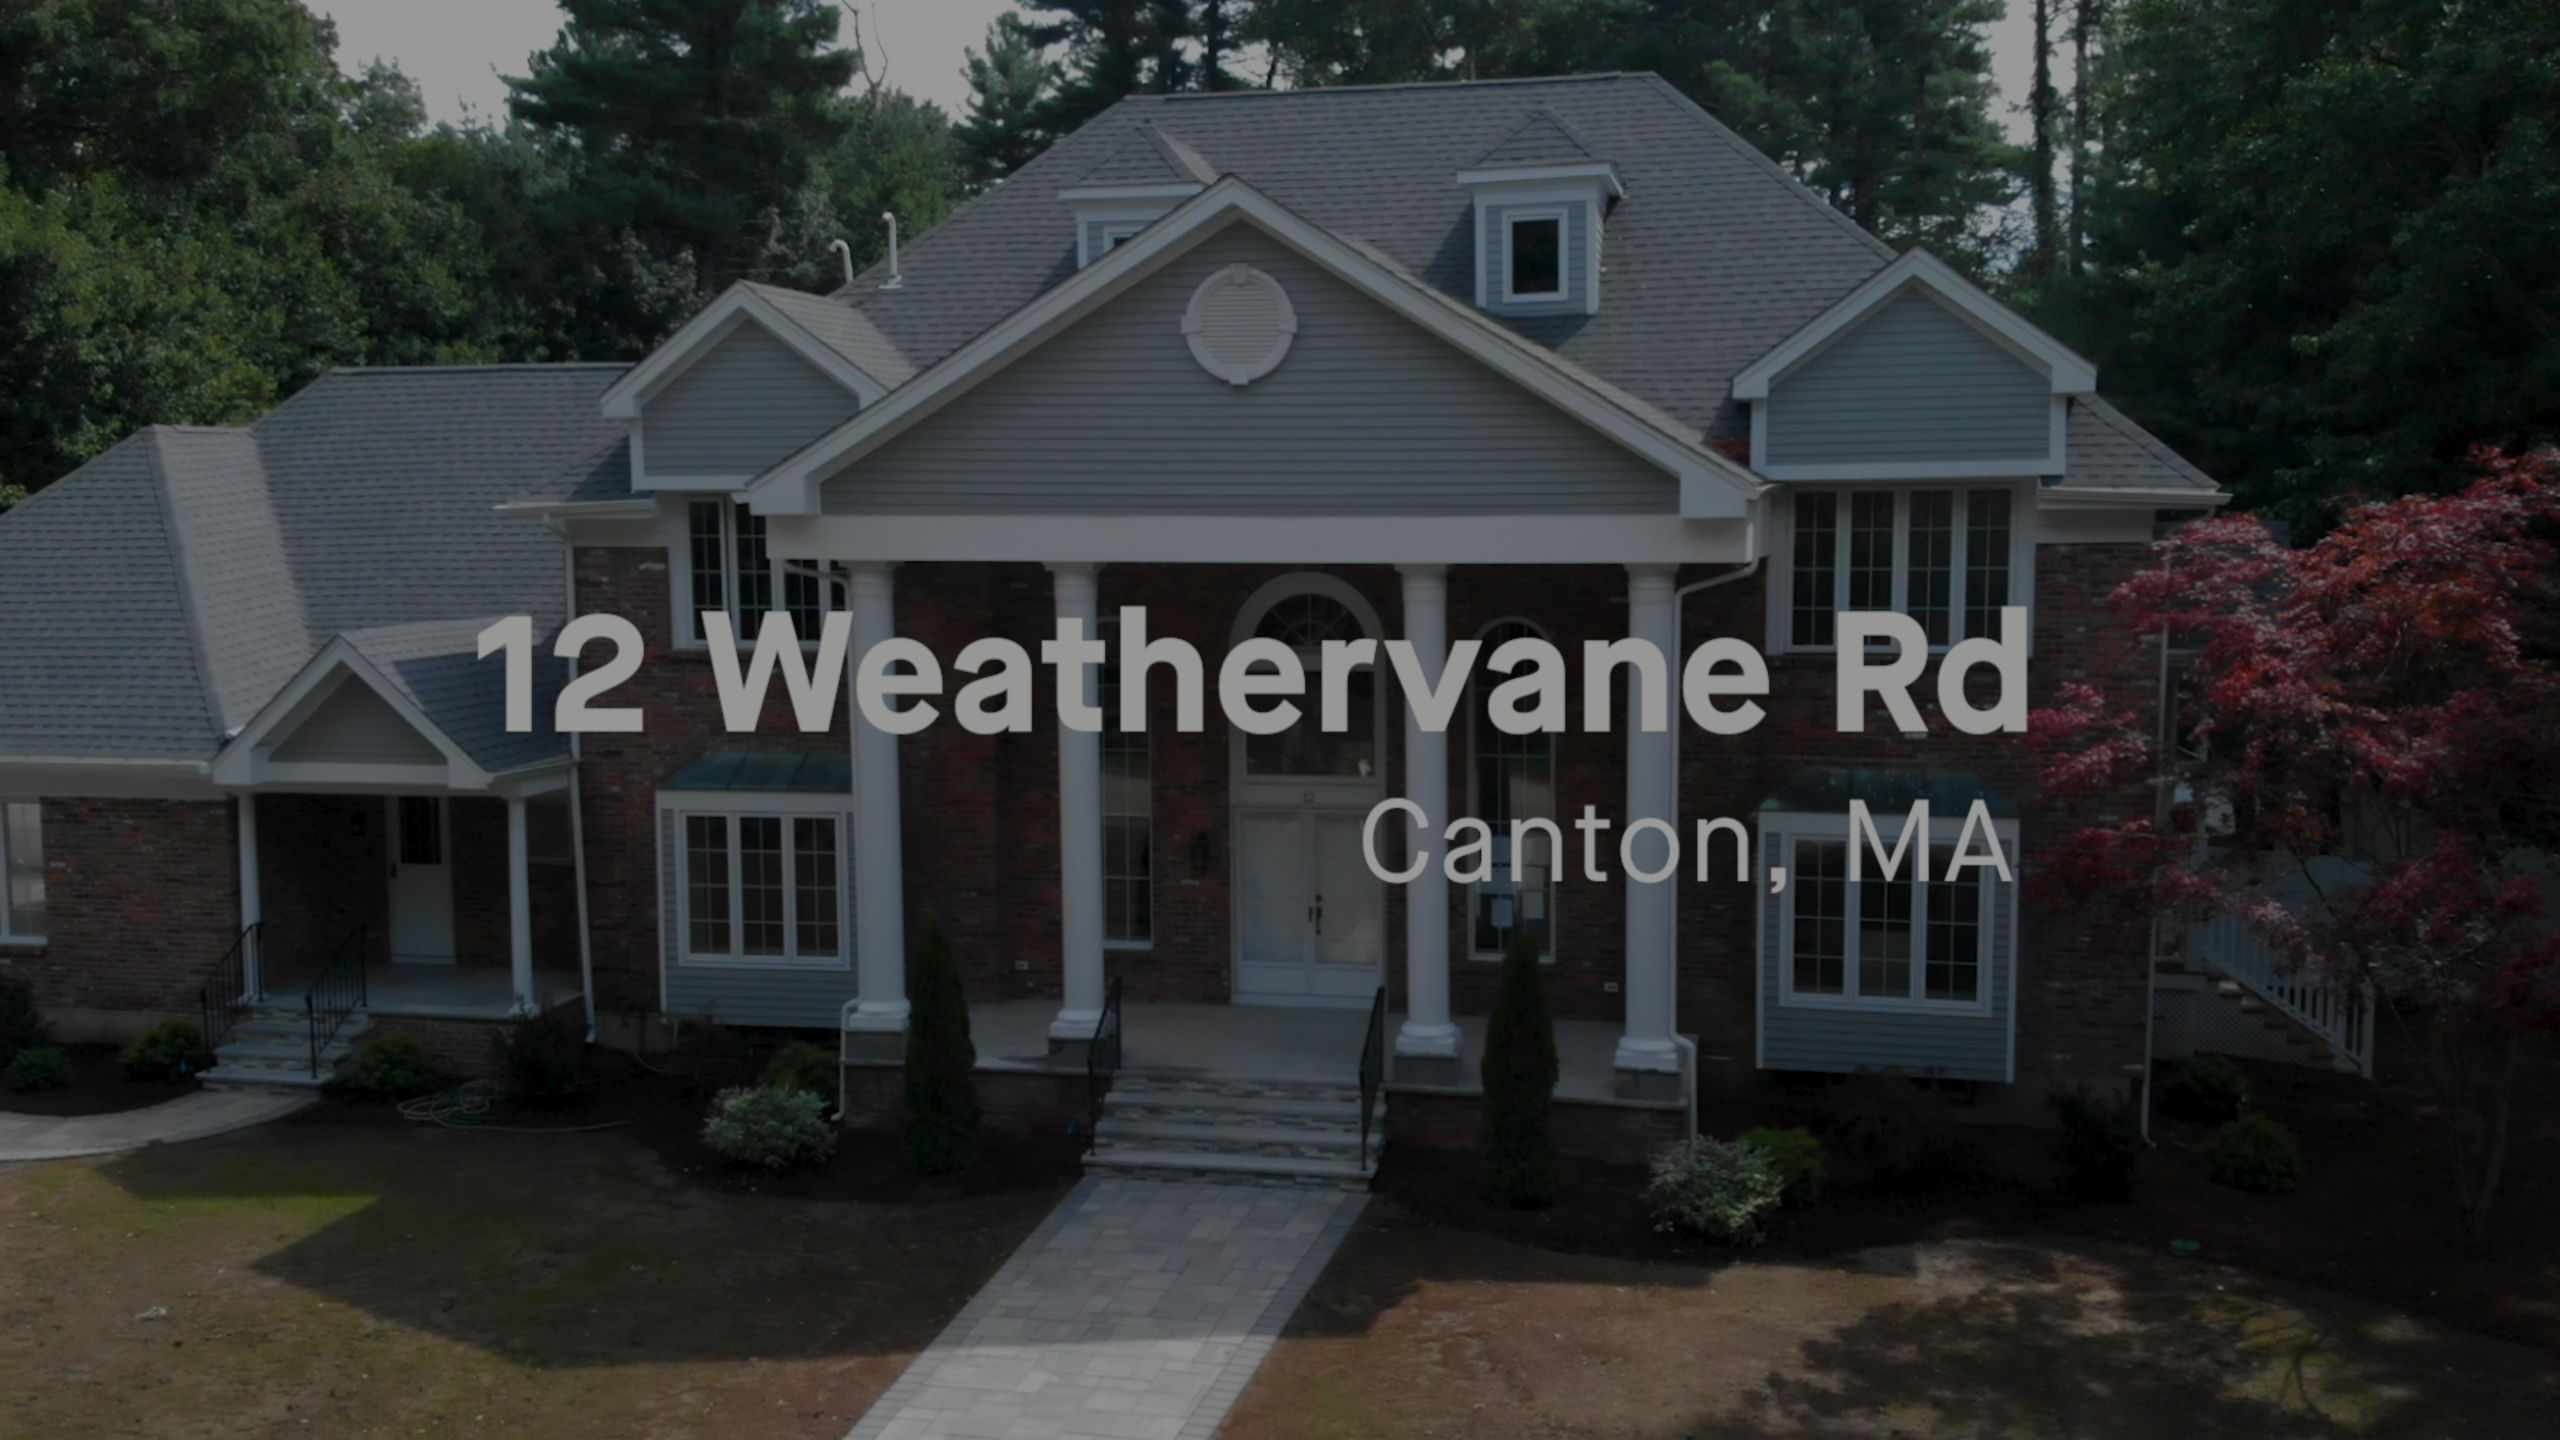 12 Weathervane Rd, Canton, MA